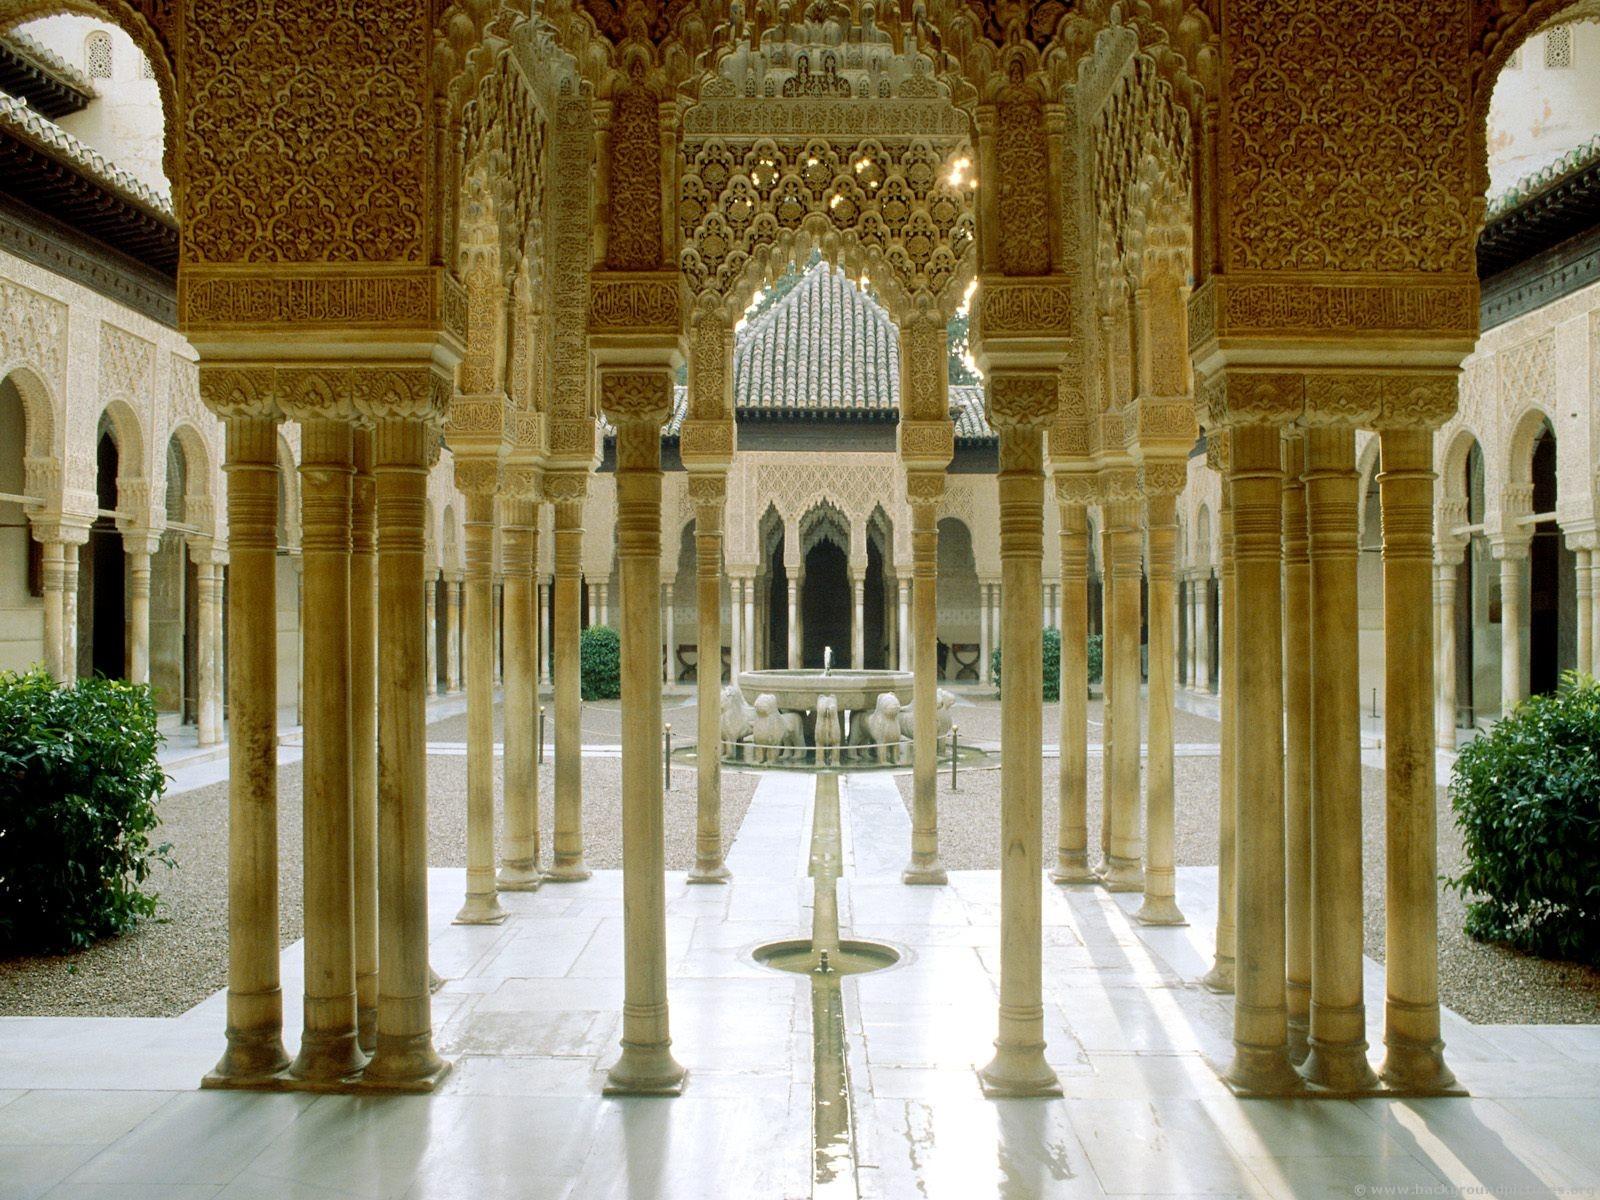 Внутренняя территория Альгамбры